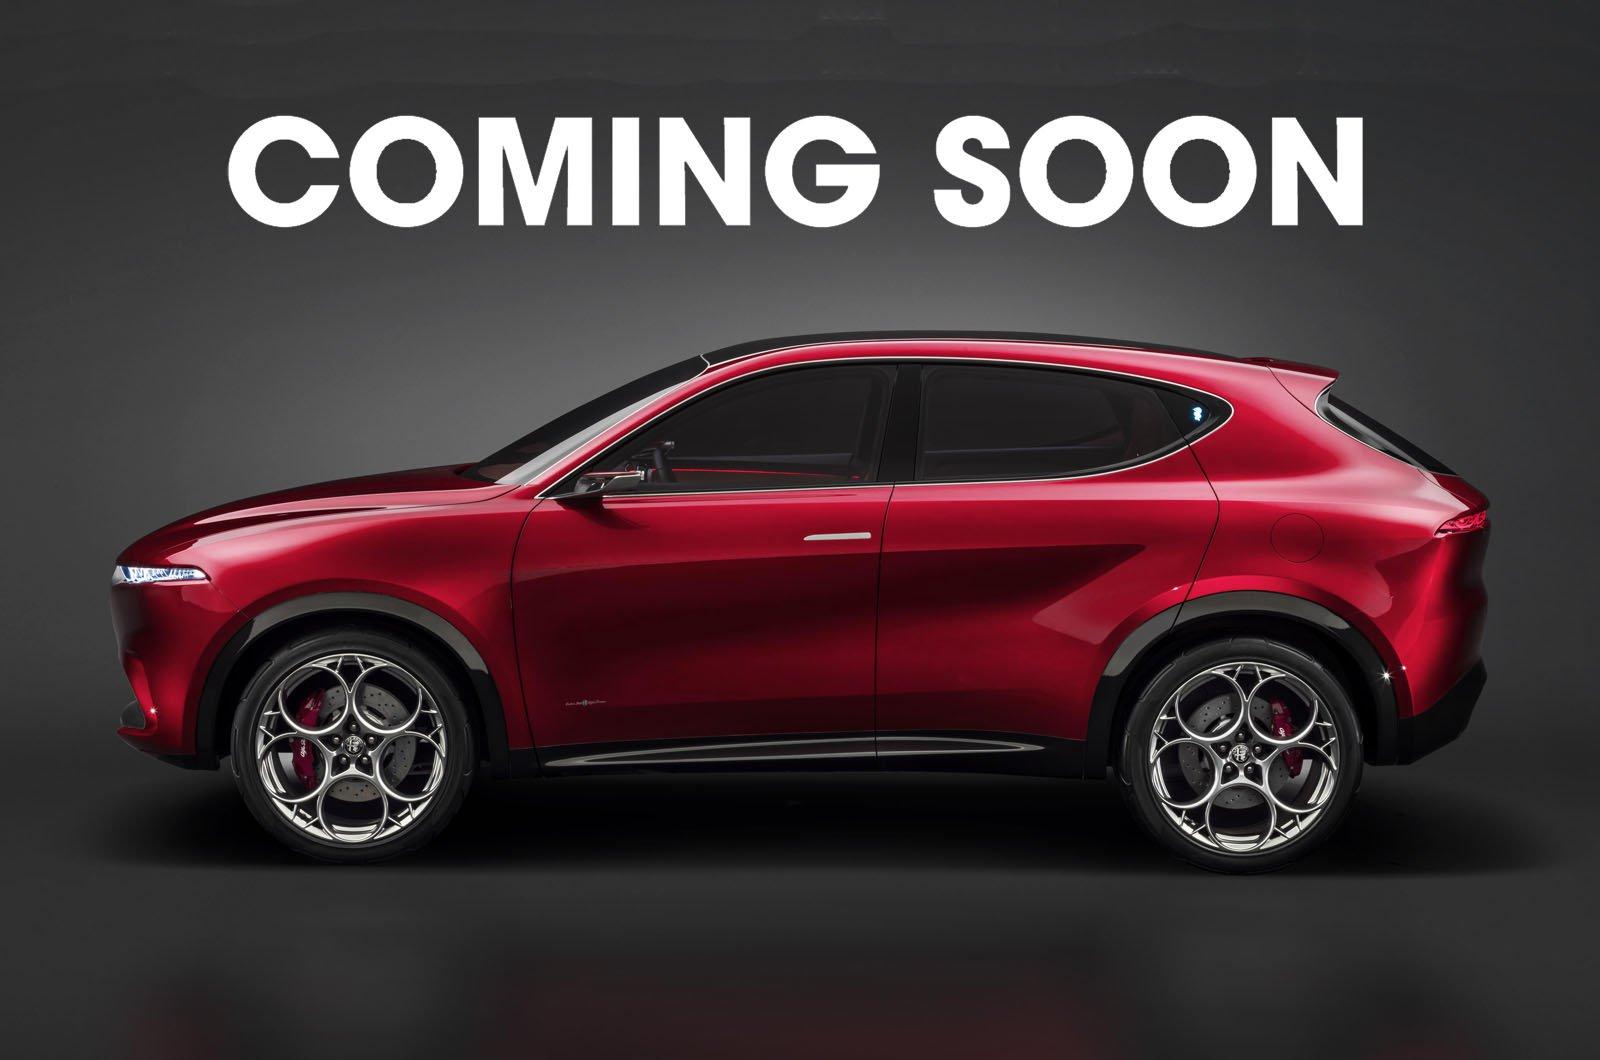 Coming soon: Alfa Romeo Tonale